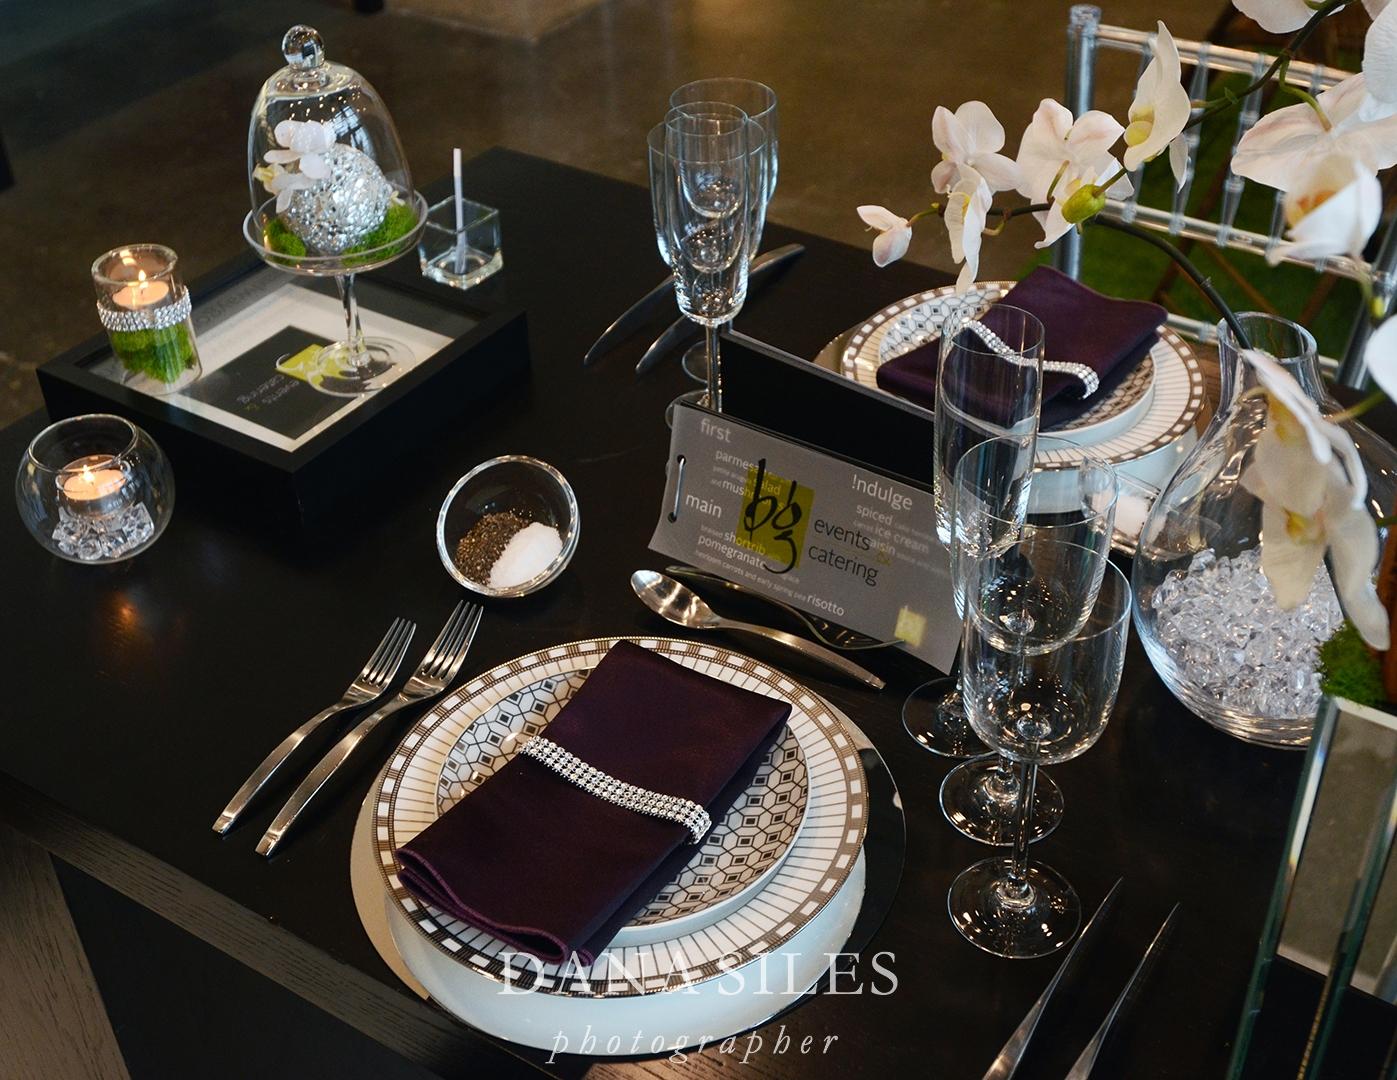 wedding decoration ideas for rectangular tables. Black Bedroom Furniture Sets. Home Design Ideas